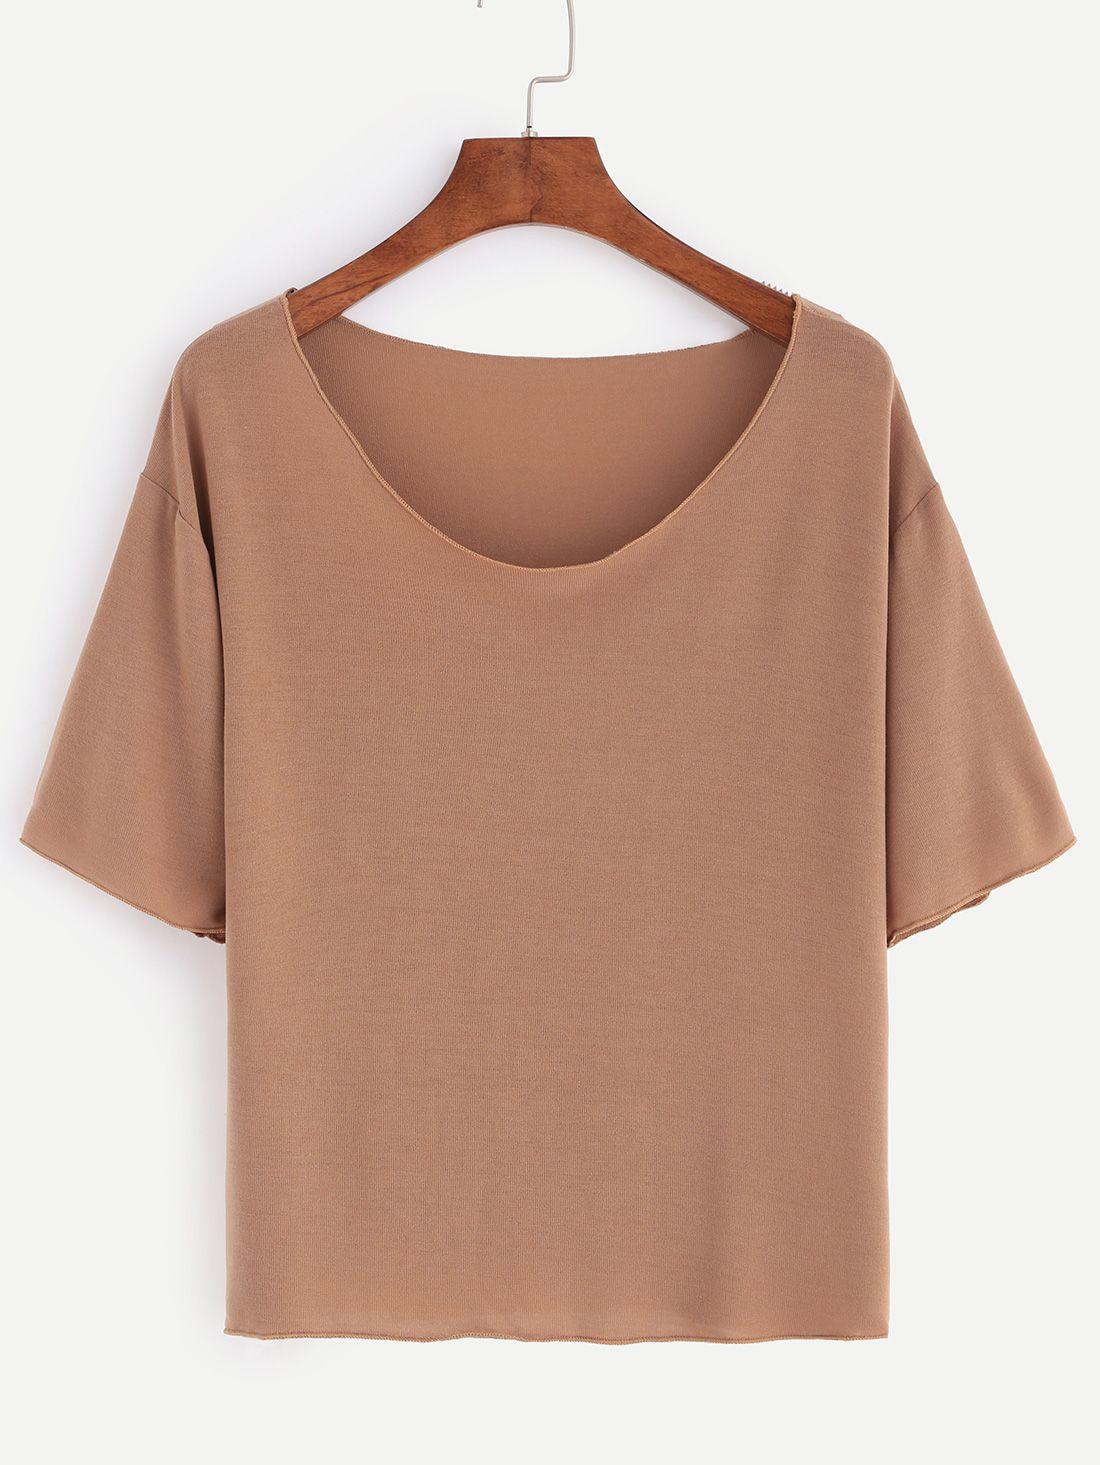 36eb6cfc21fb Light Brown Scoop Neck Plain T-shirt   My Style   Fashion, Scoop ...